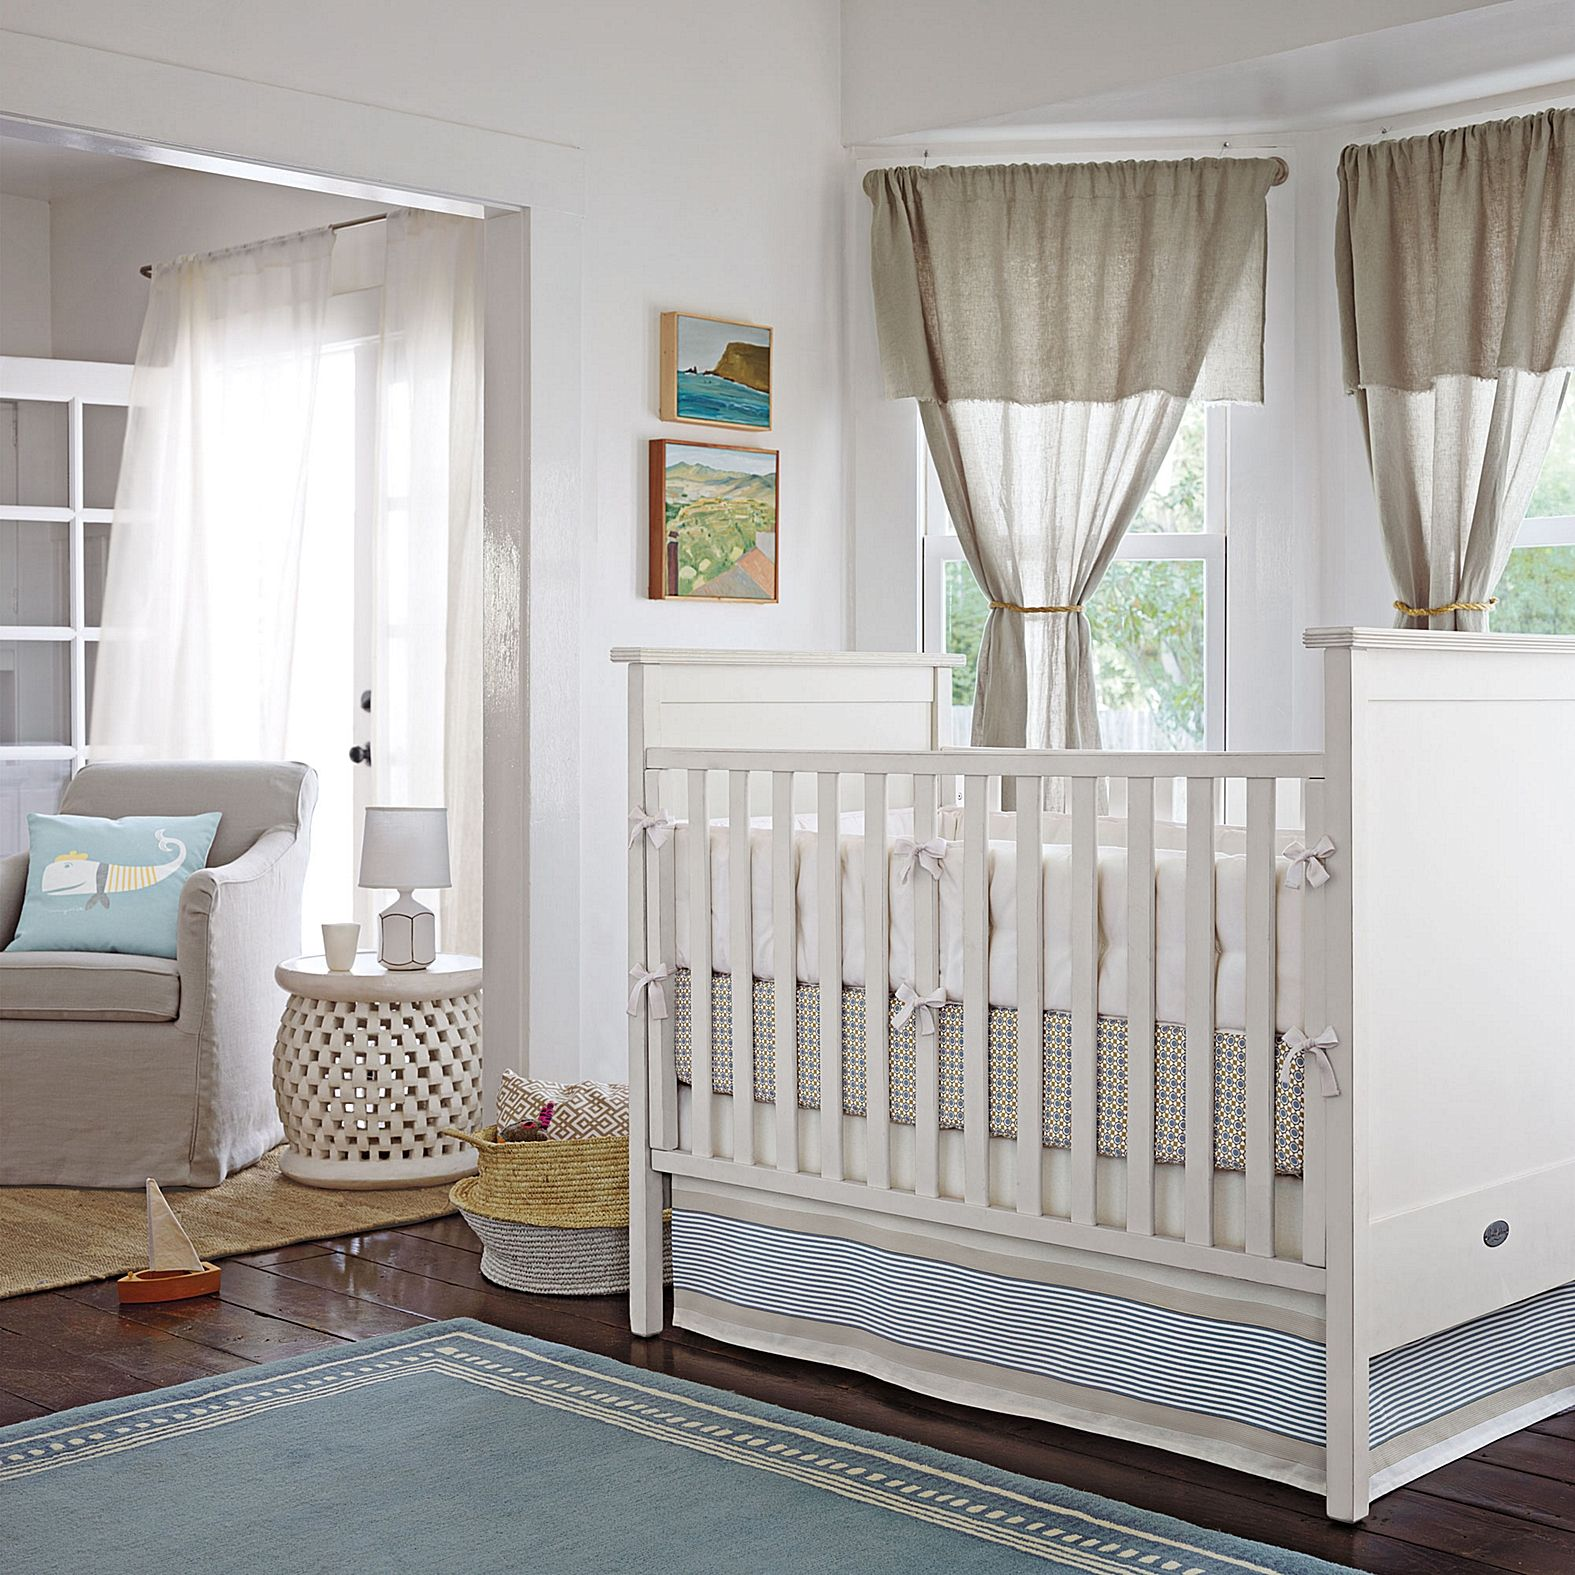 set bedding cribs sea crib sets baby amazon under nursery pcs dp boy sisi the zl for com